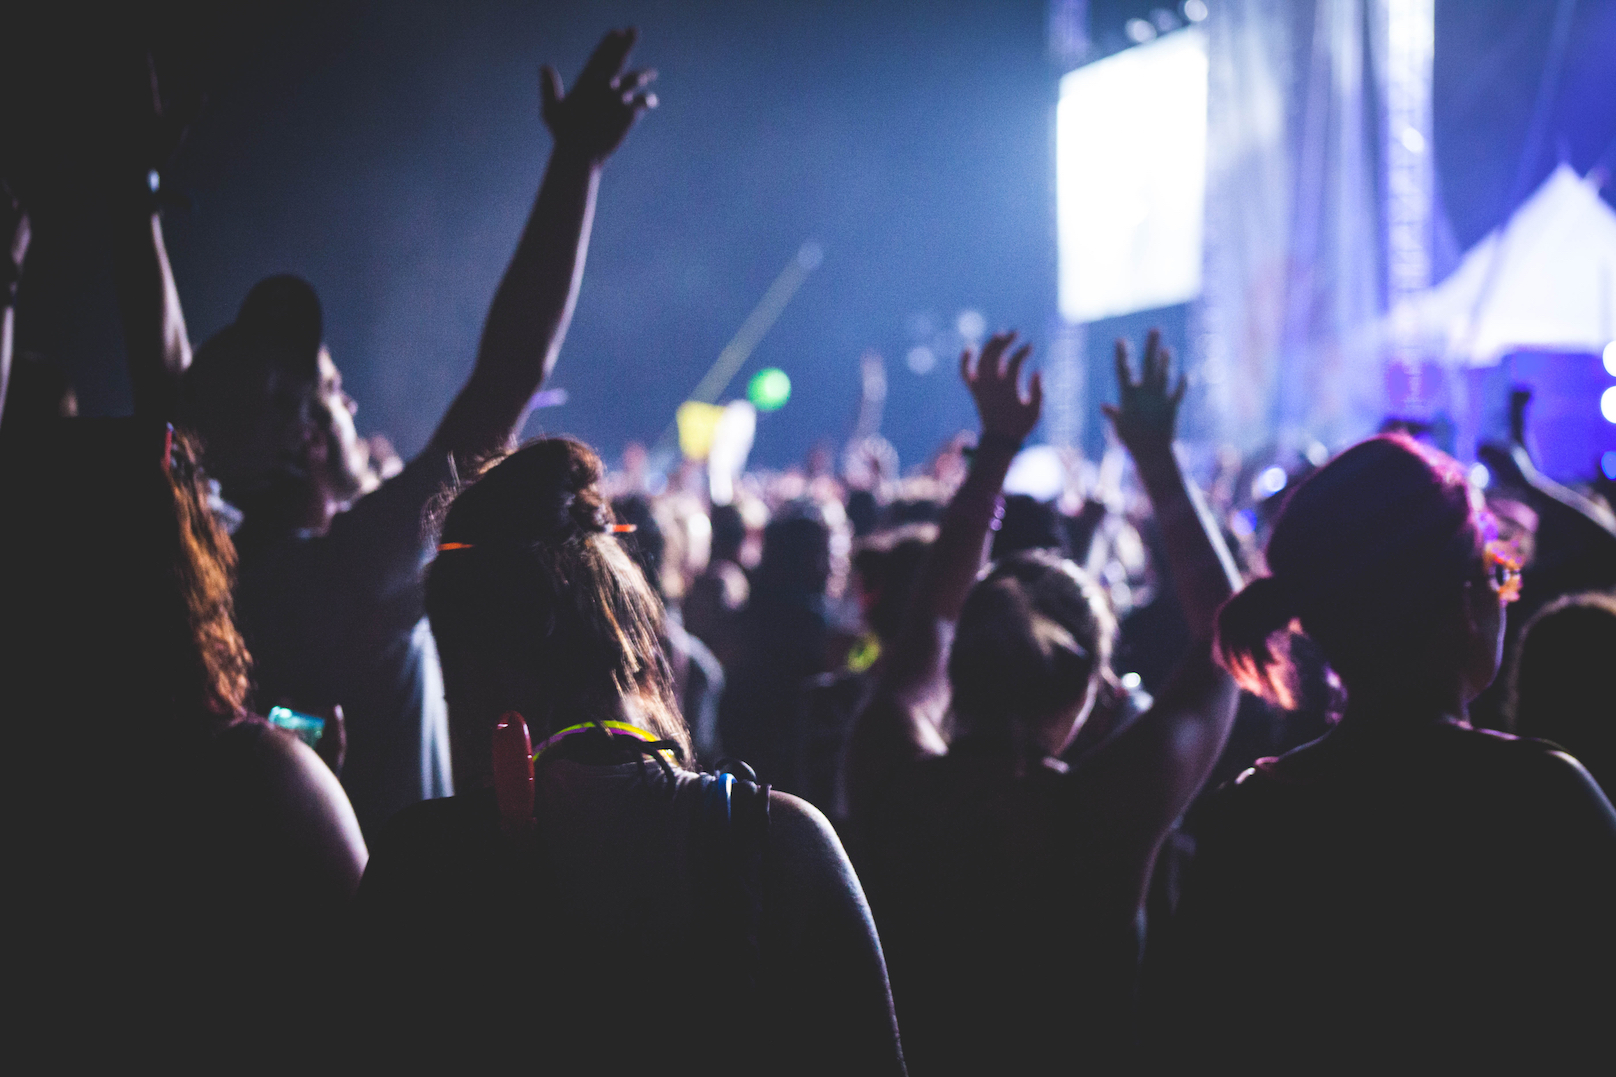 A Short History of UK Festivals